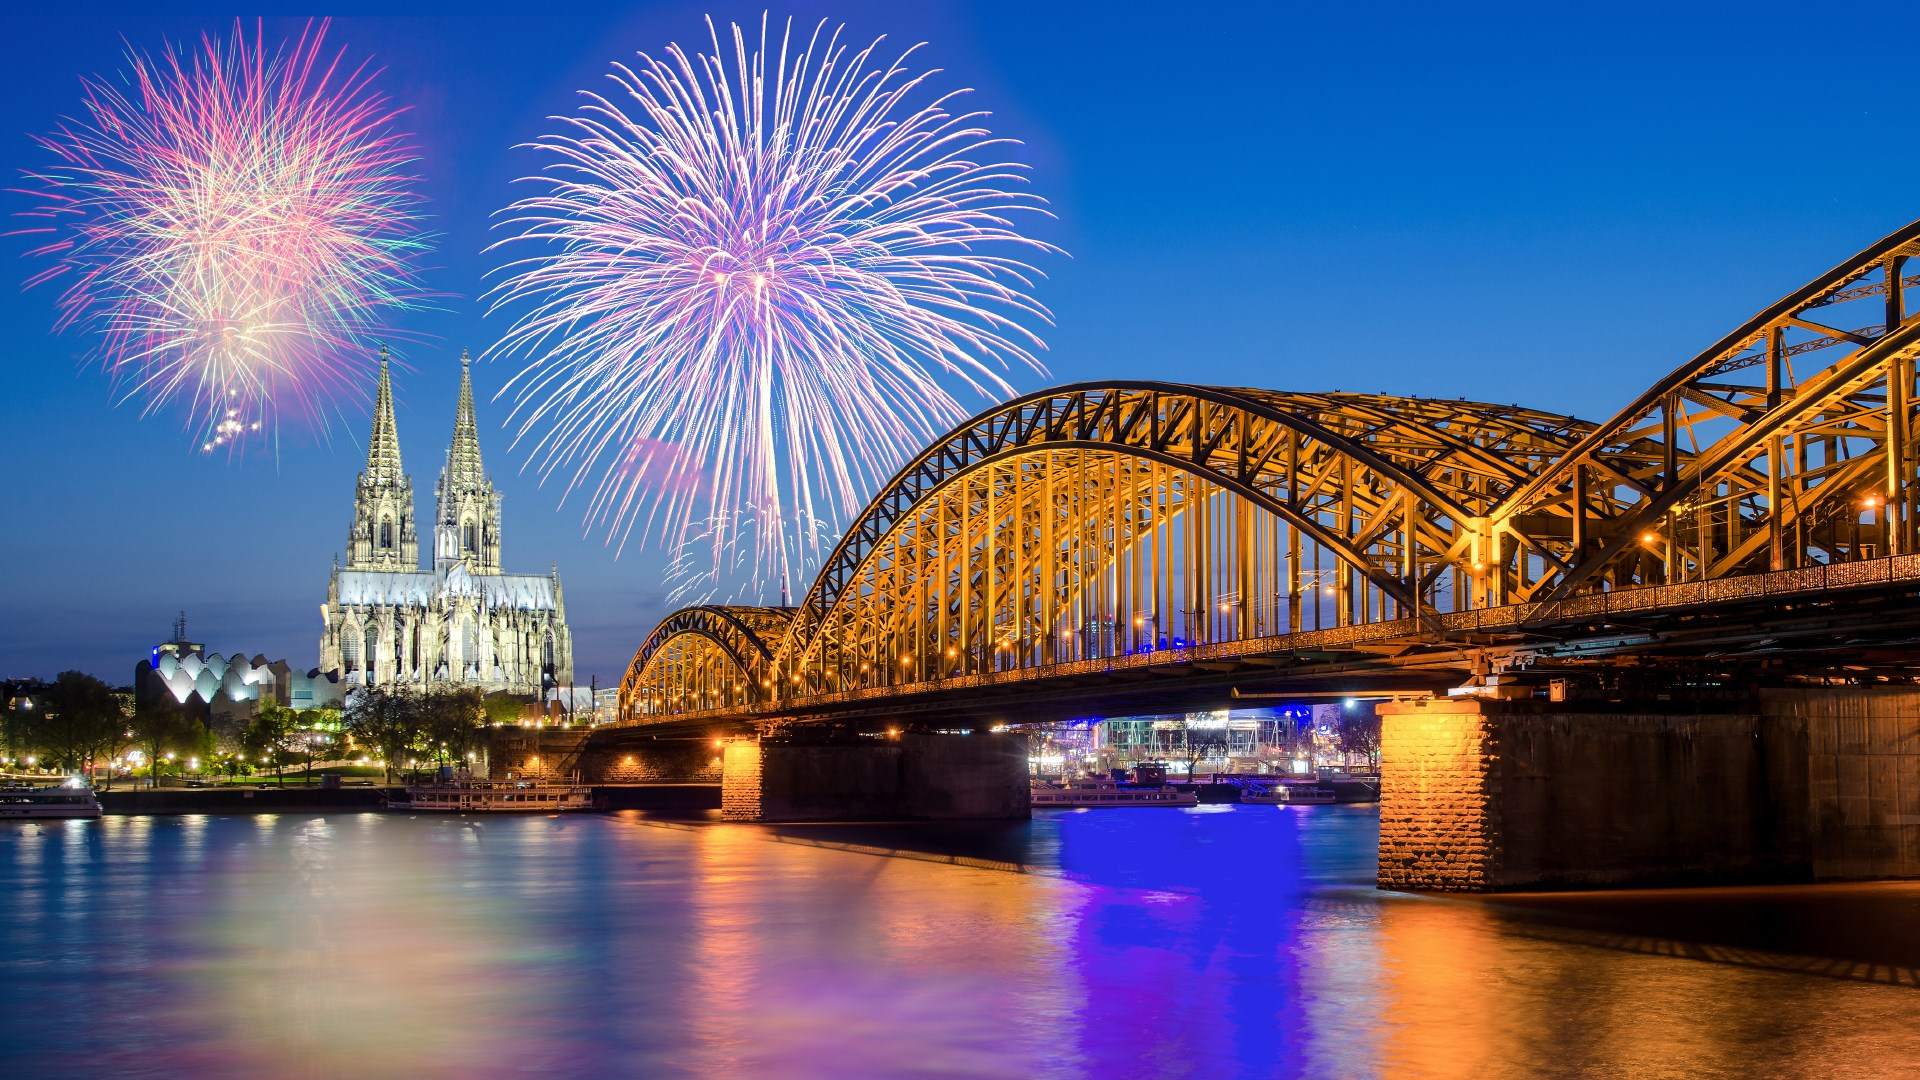 new year wallpaper,bridge,landmark,reflection,fireworks,night